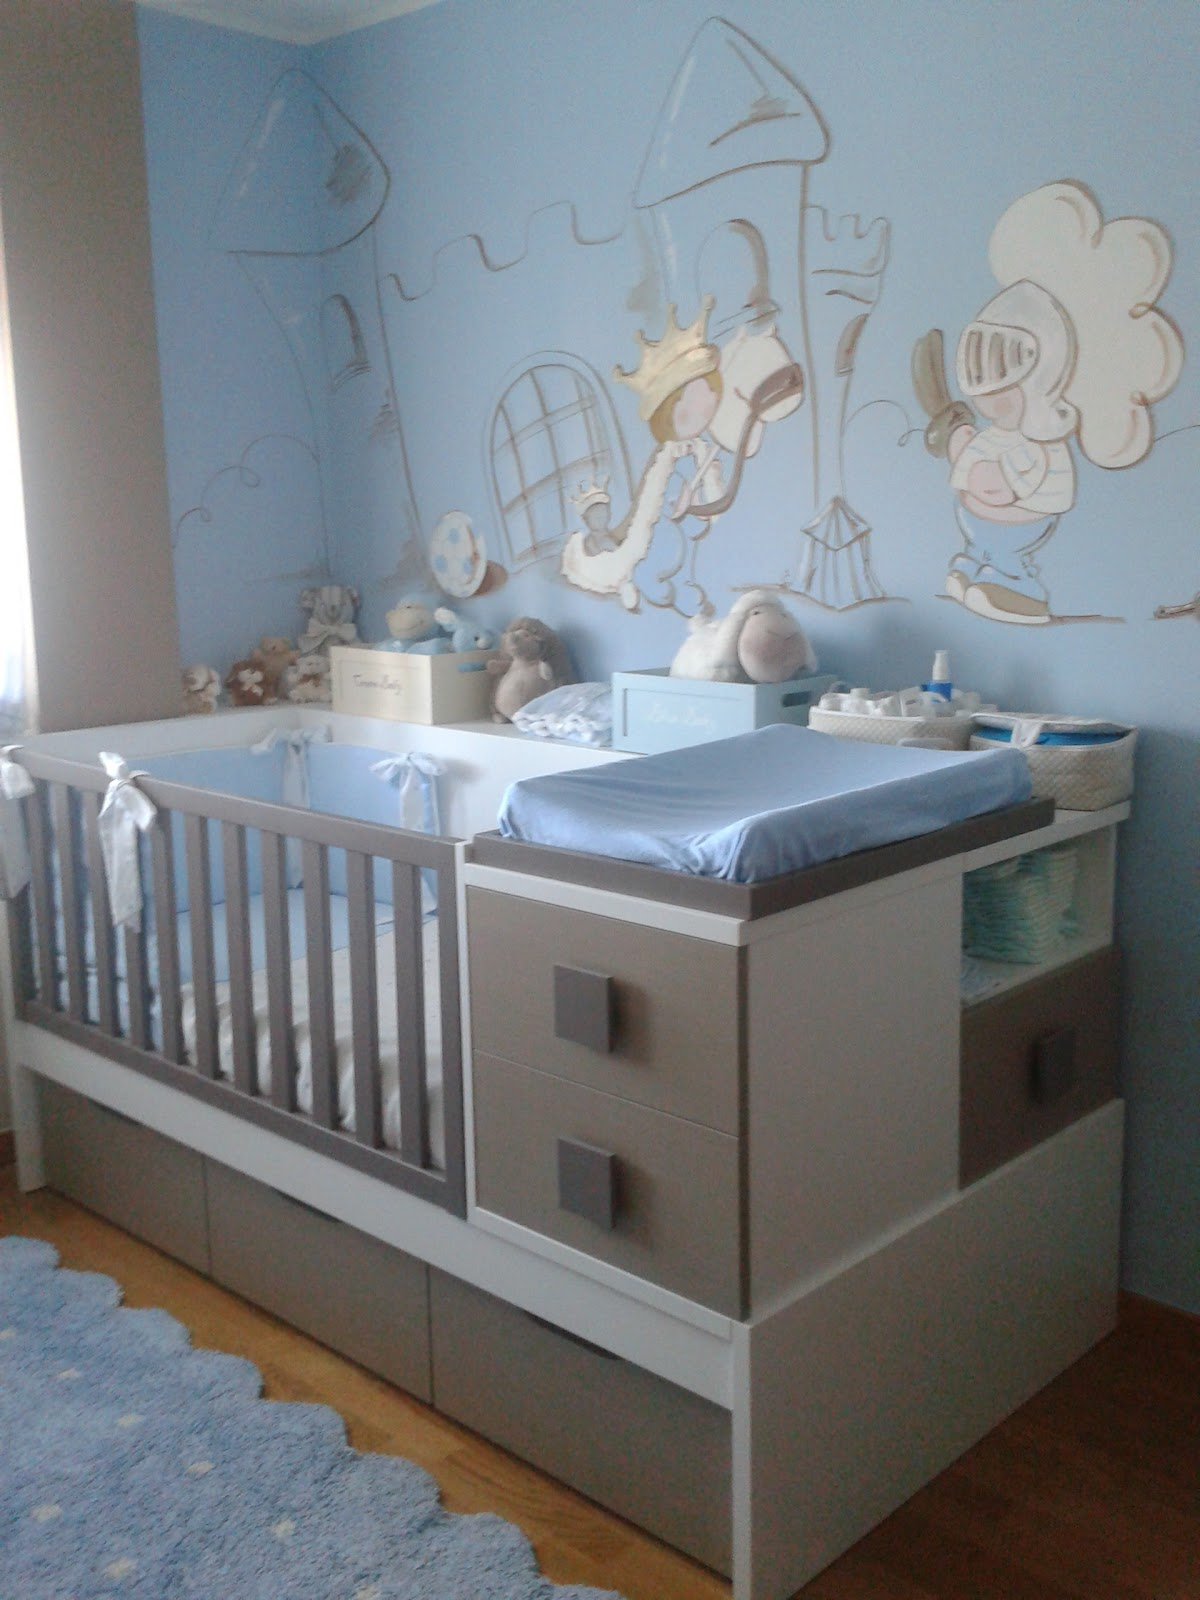 deco chambre b b. Black Bedroom Furniture Sets. Home Design Ideas